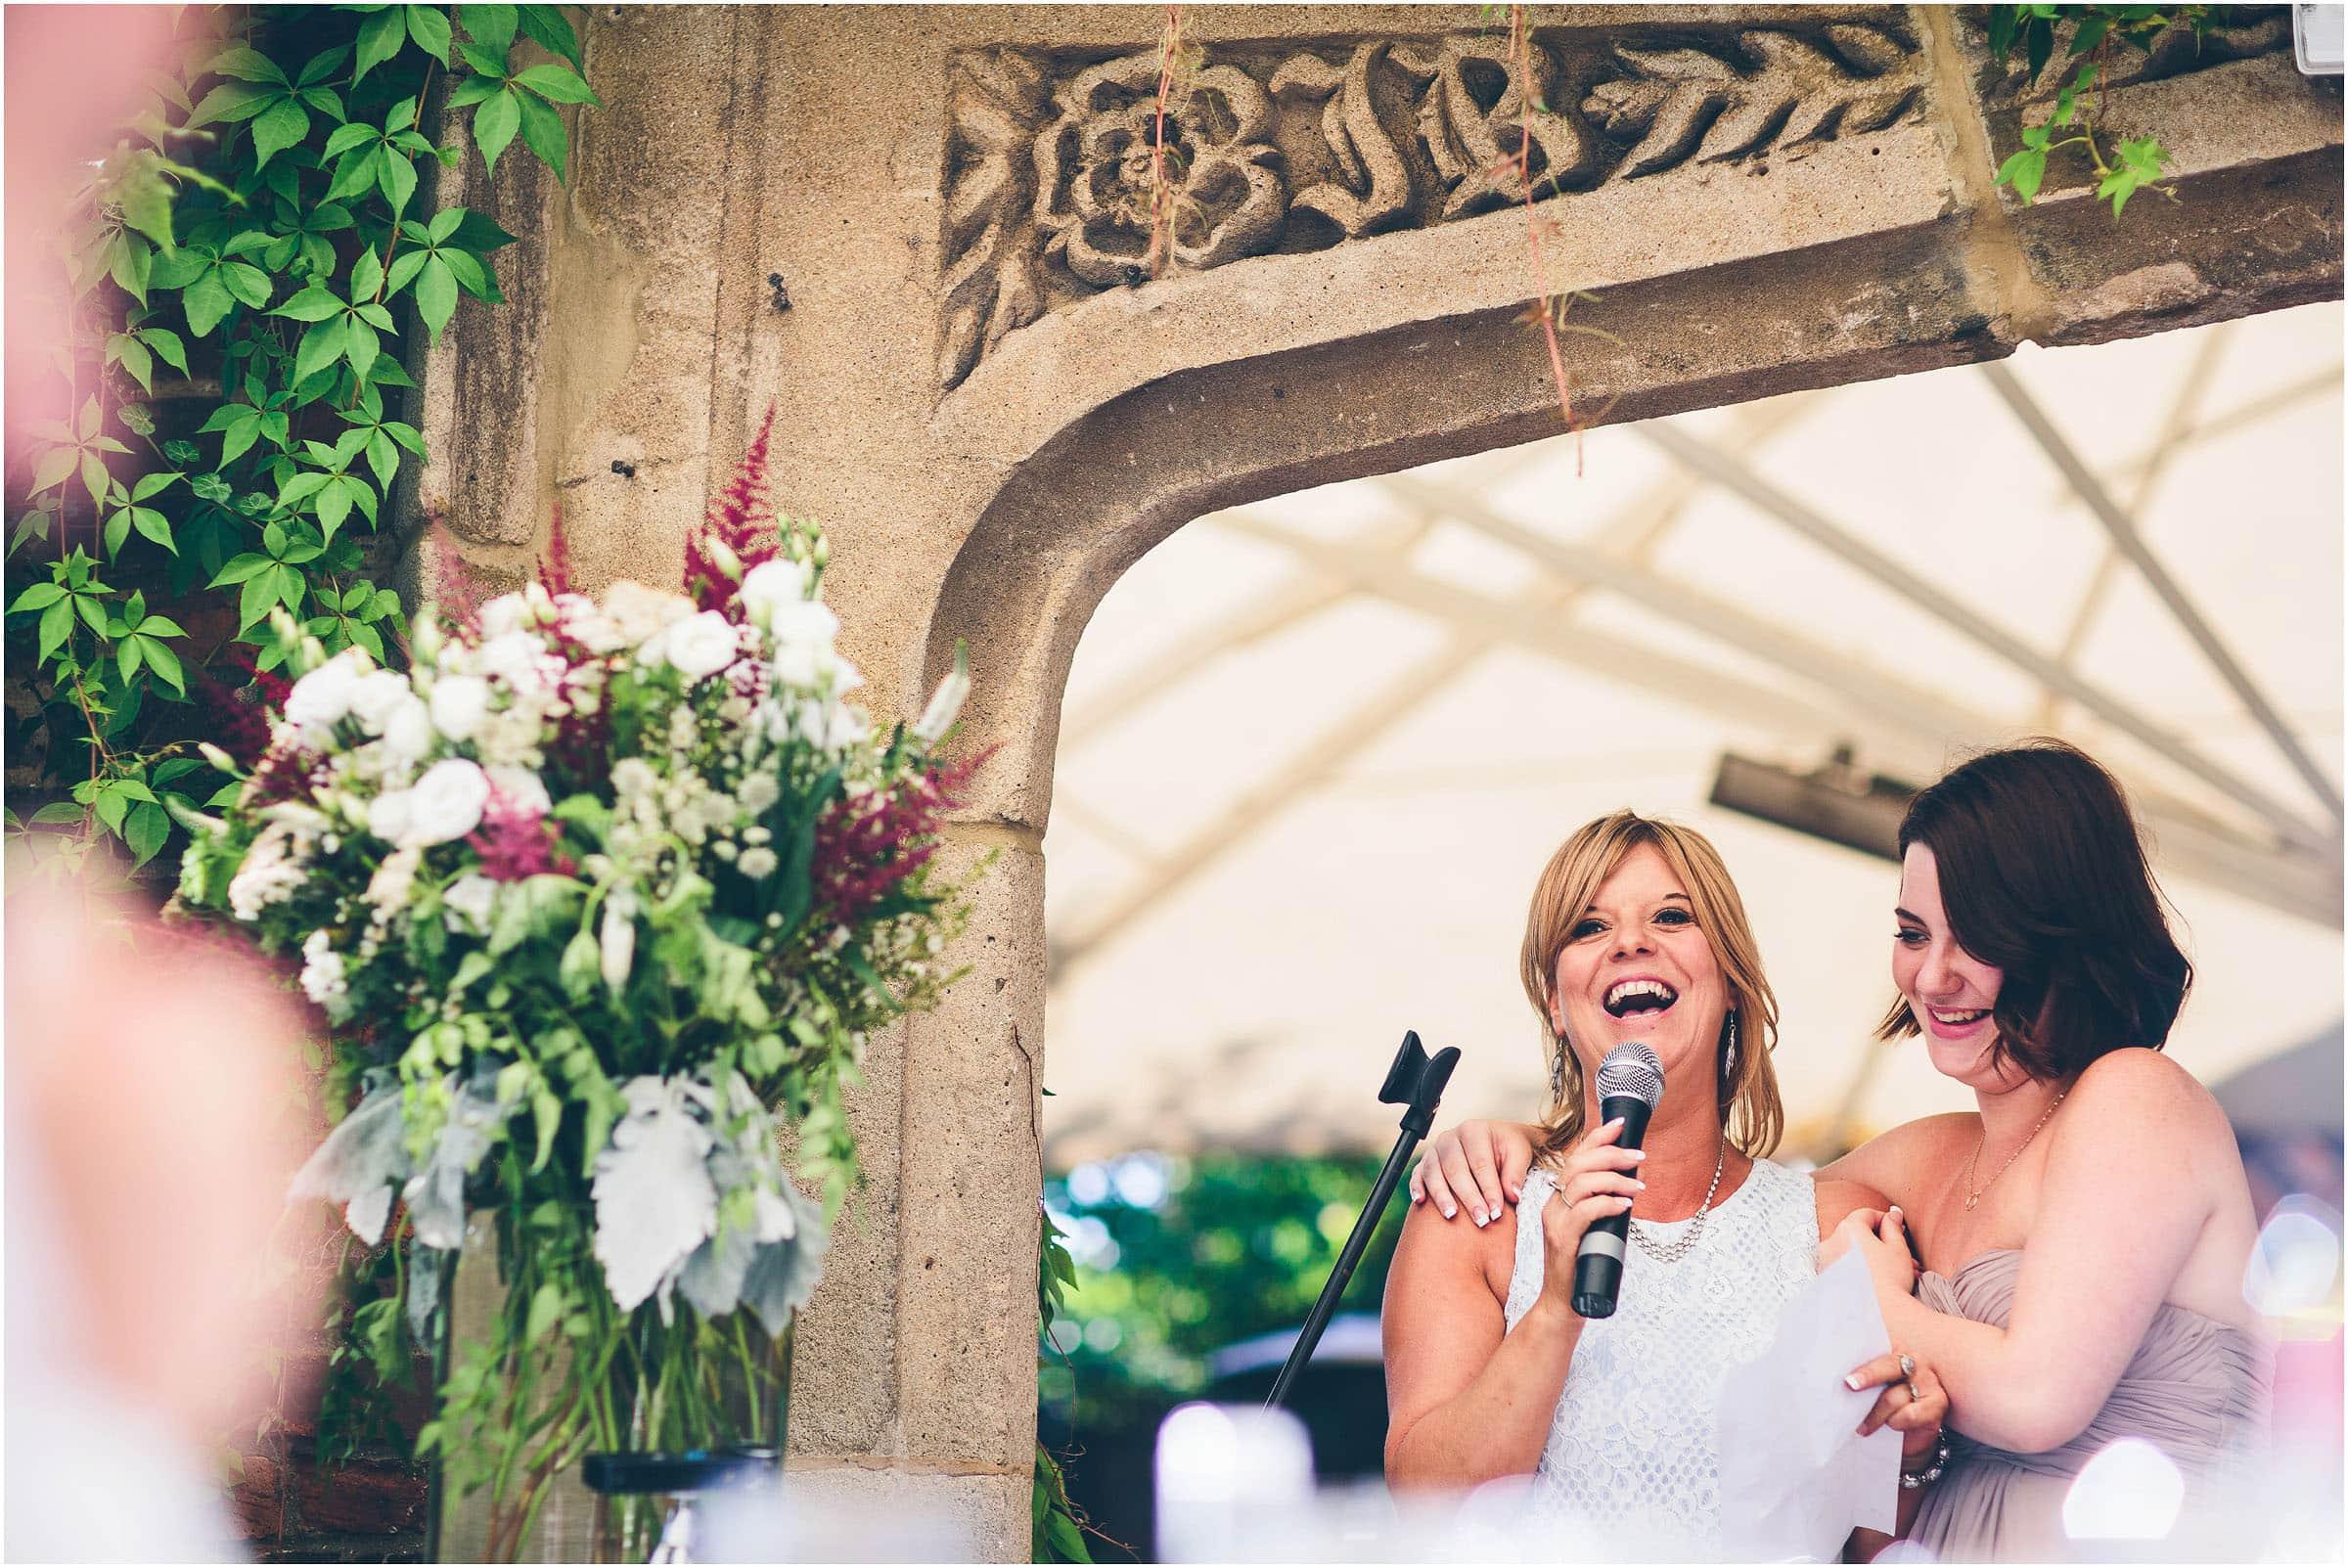 Kensington_Roof_Gardens_Wedding_Photography_0088